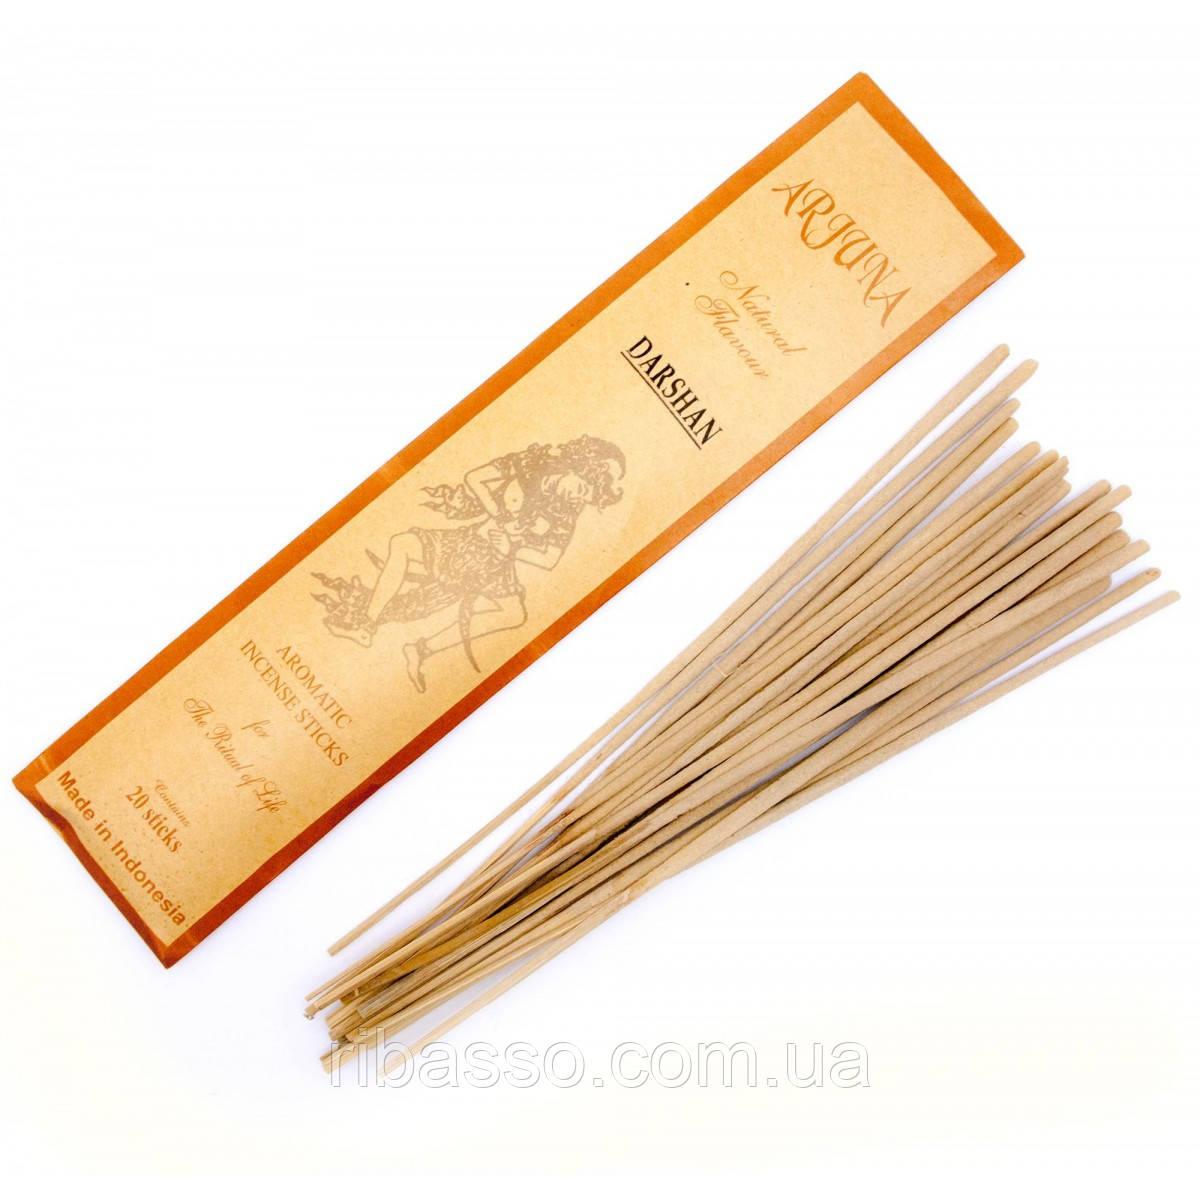 Darshan Даршан Arjuna пыльцовое благовоние Индонезия 29450